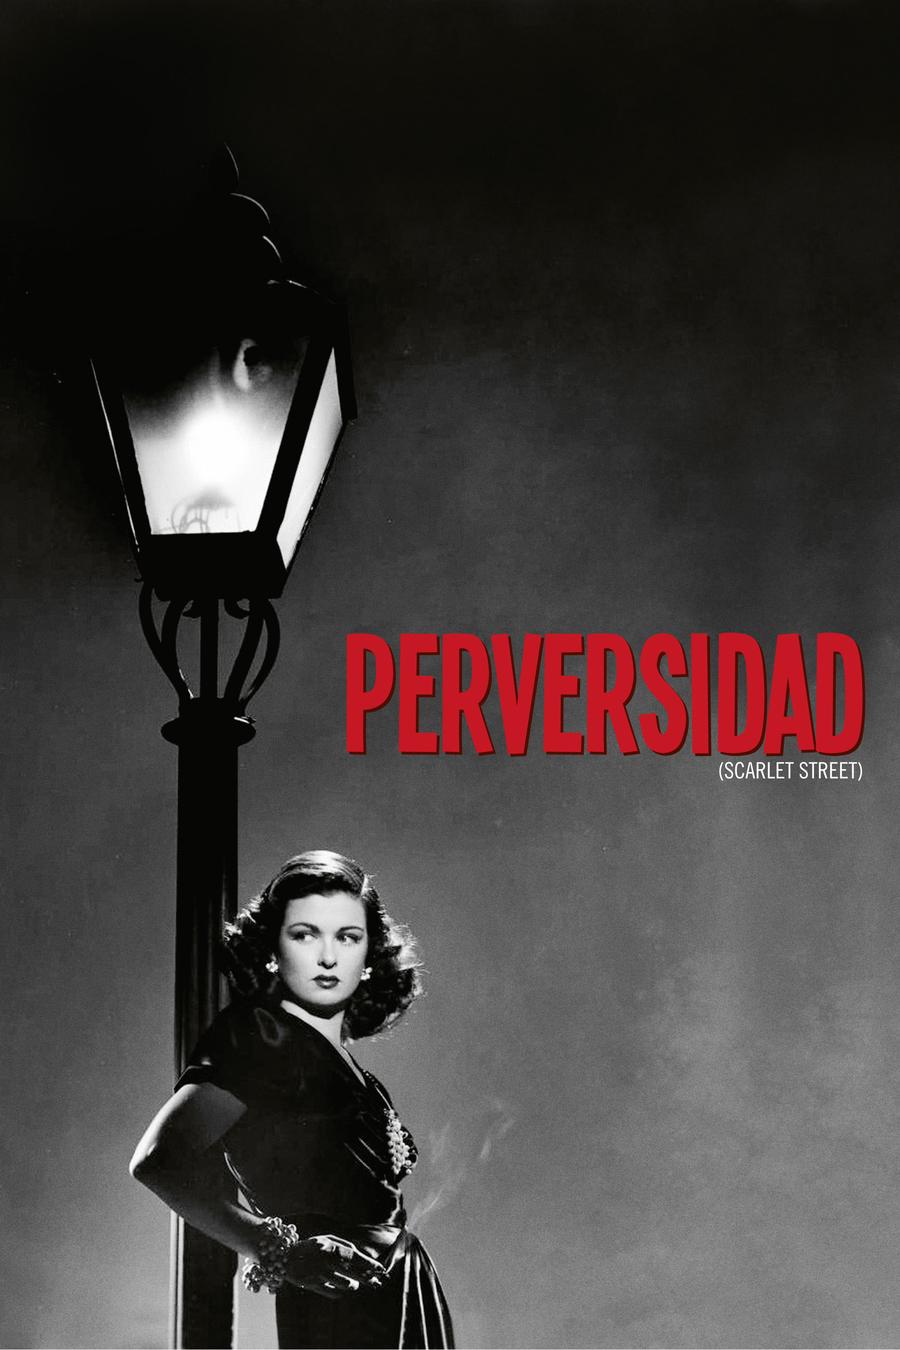 Perversidad